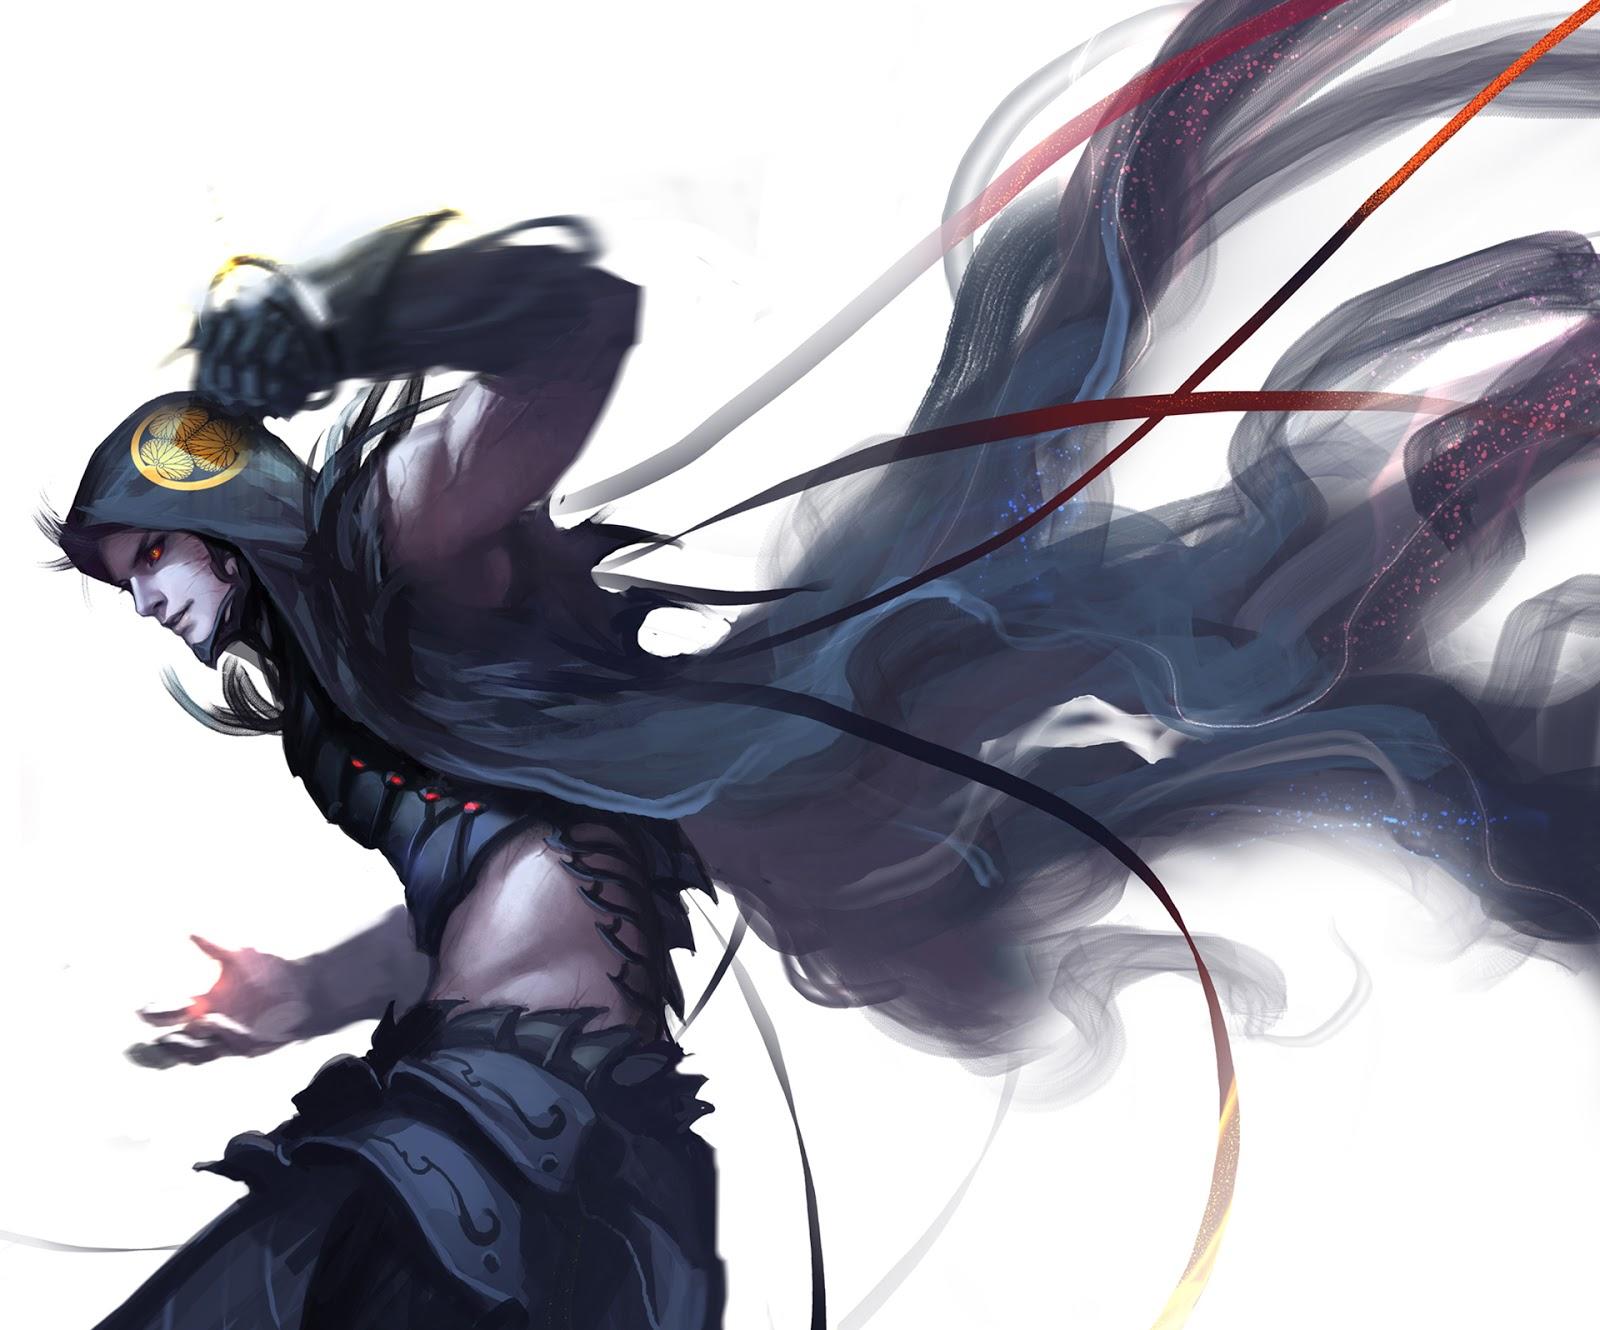 Hd wallpaper fist male black cape 1992 - Anime male wallpaper hd ...